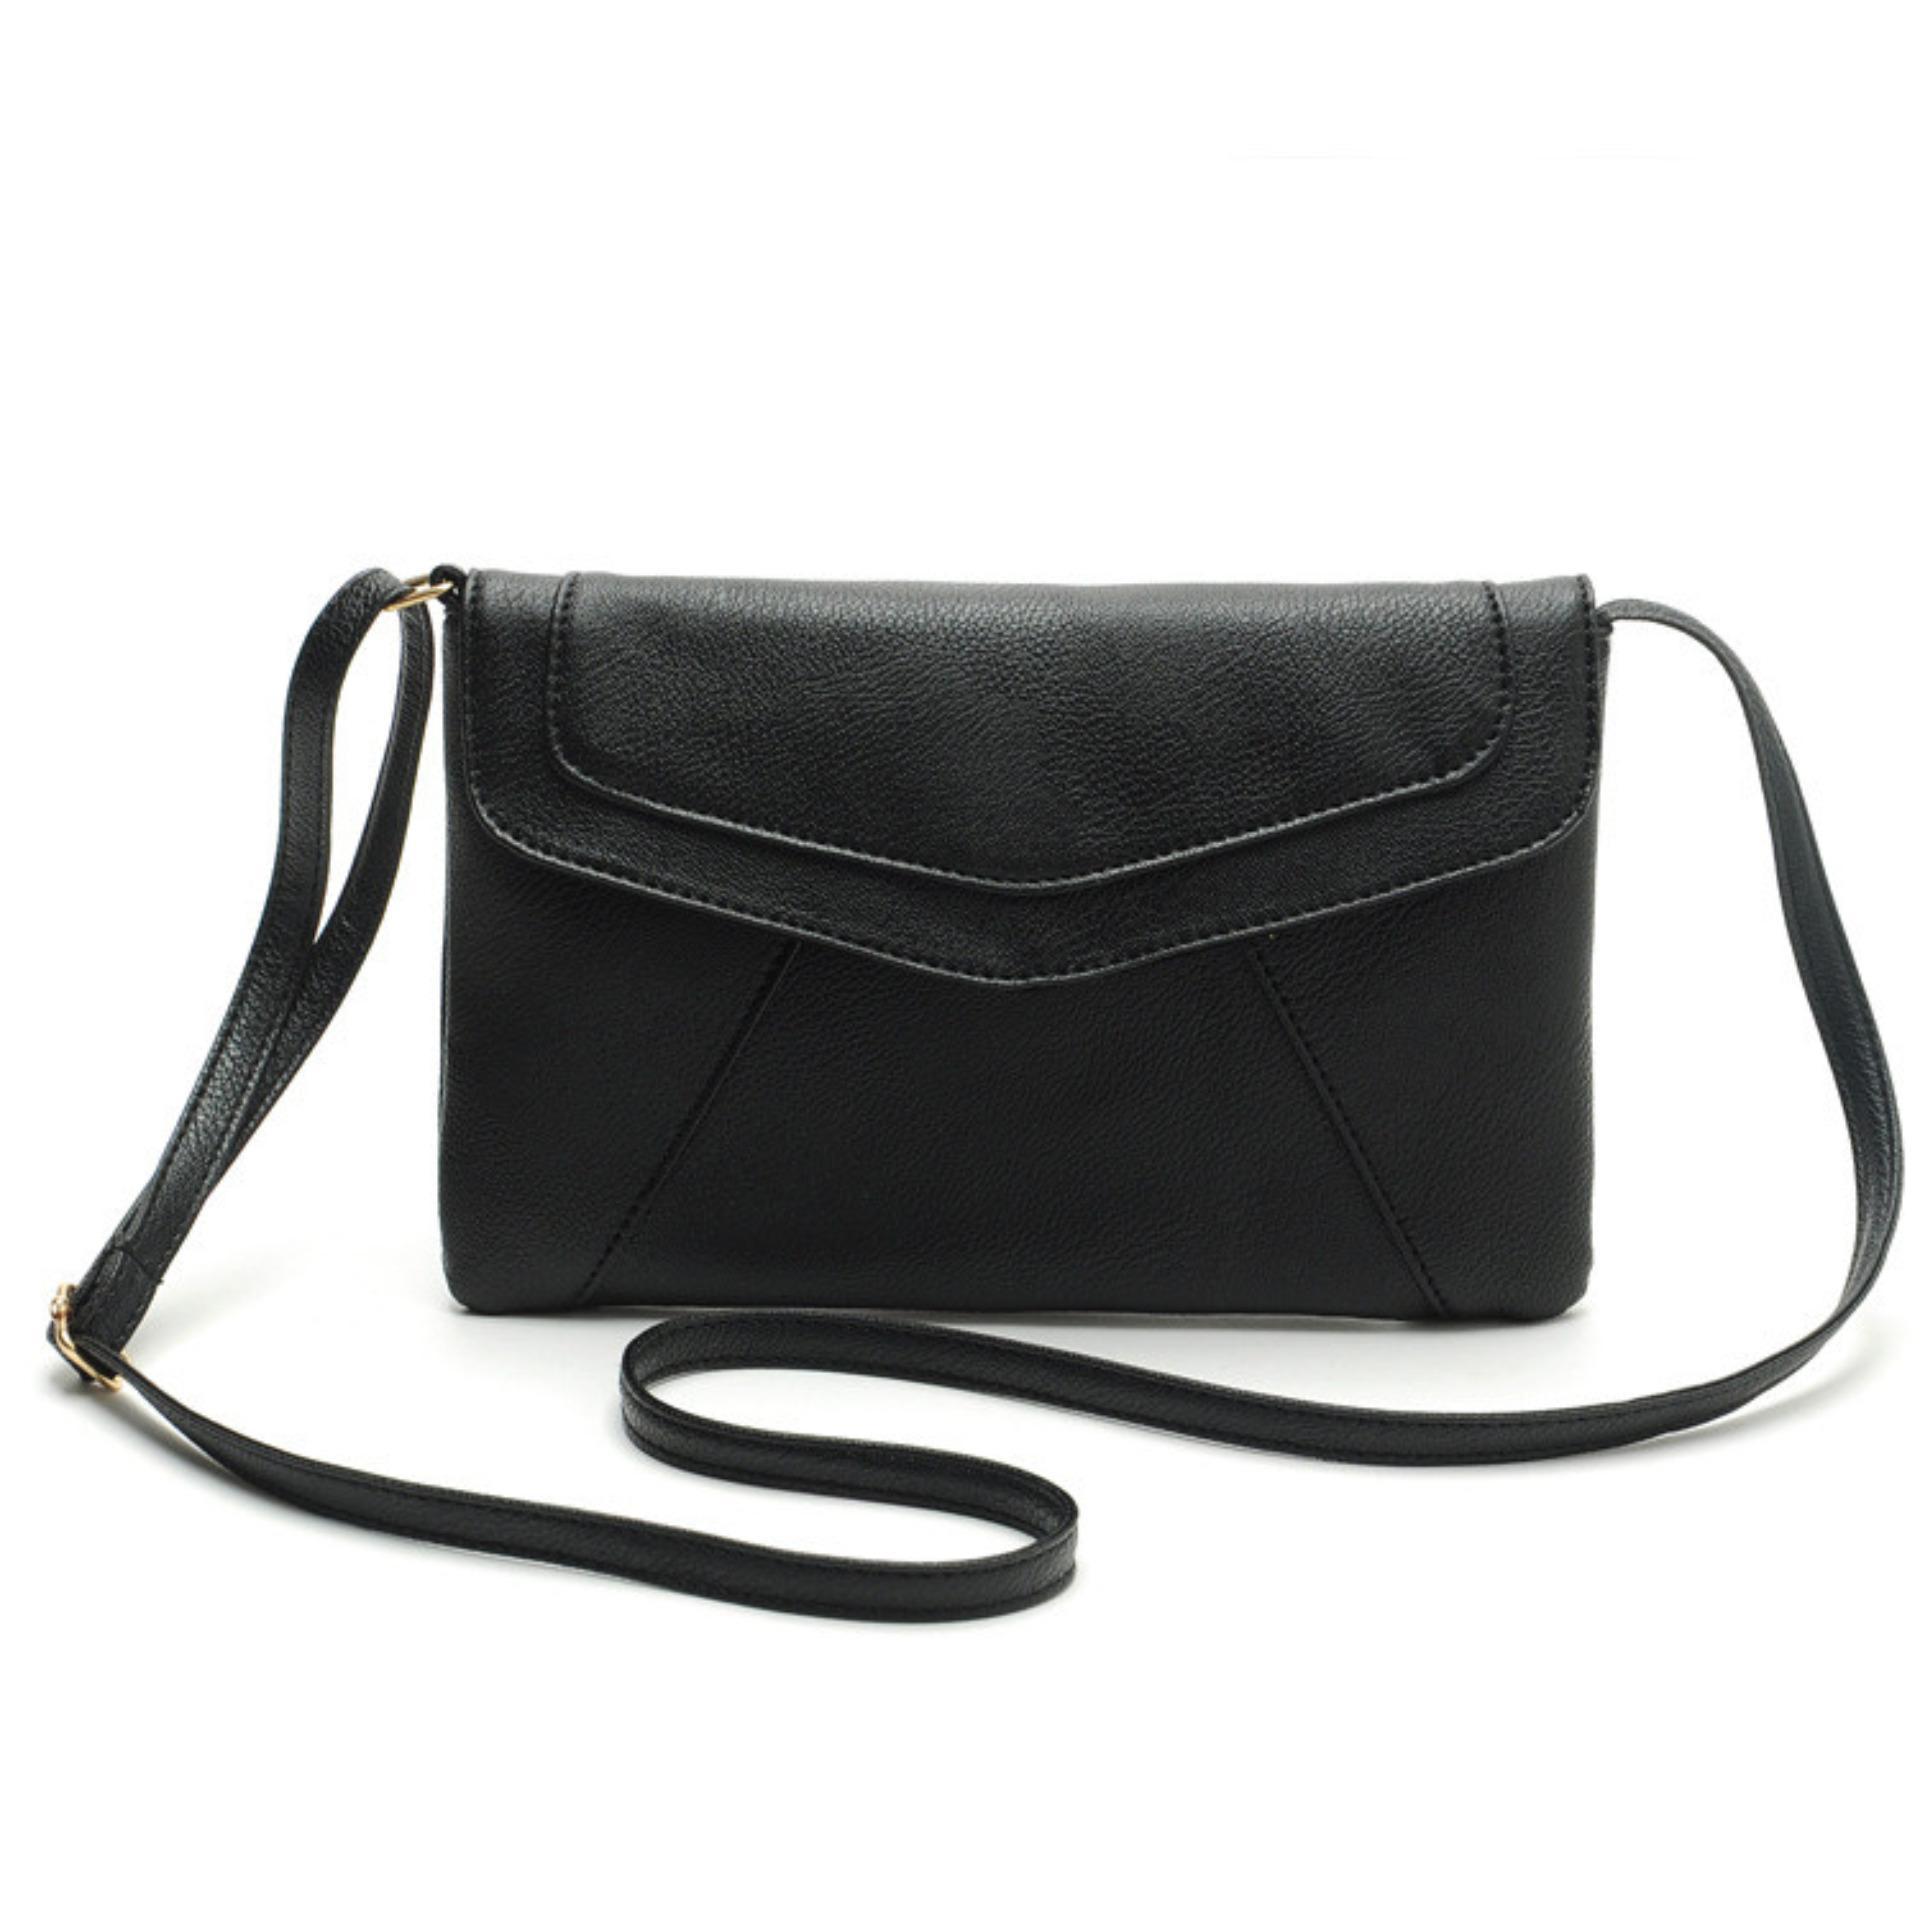 Fashion Handbag Daftar Harga November 2018 Catriona Maika Top Handle Bag Black